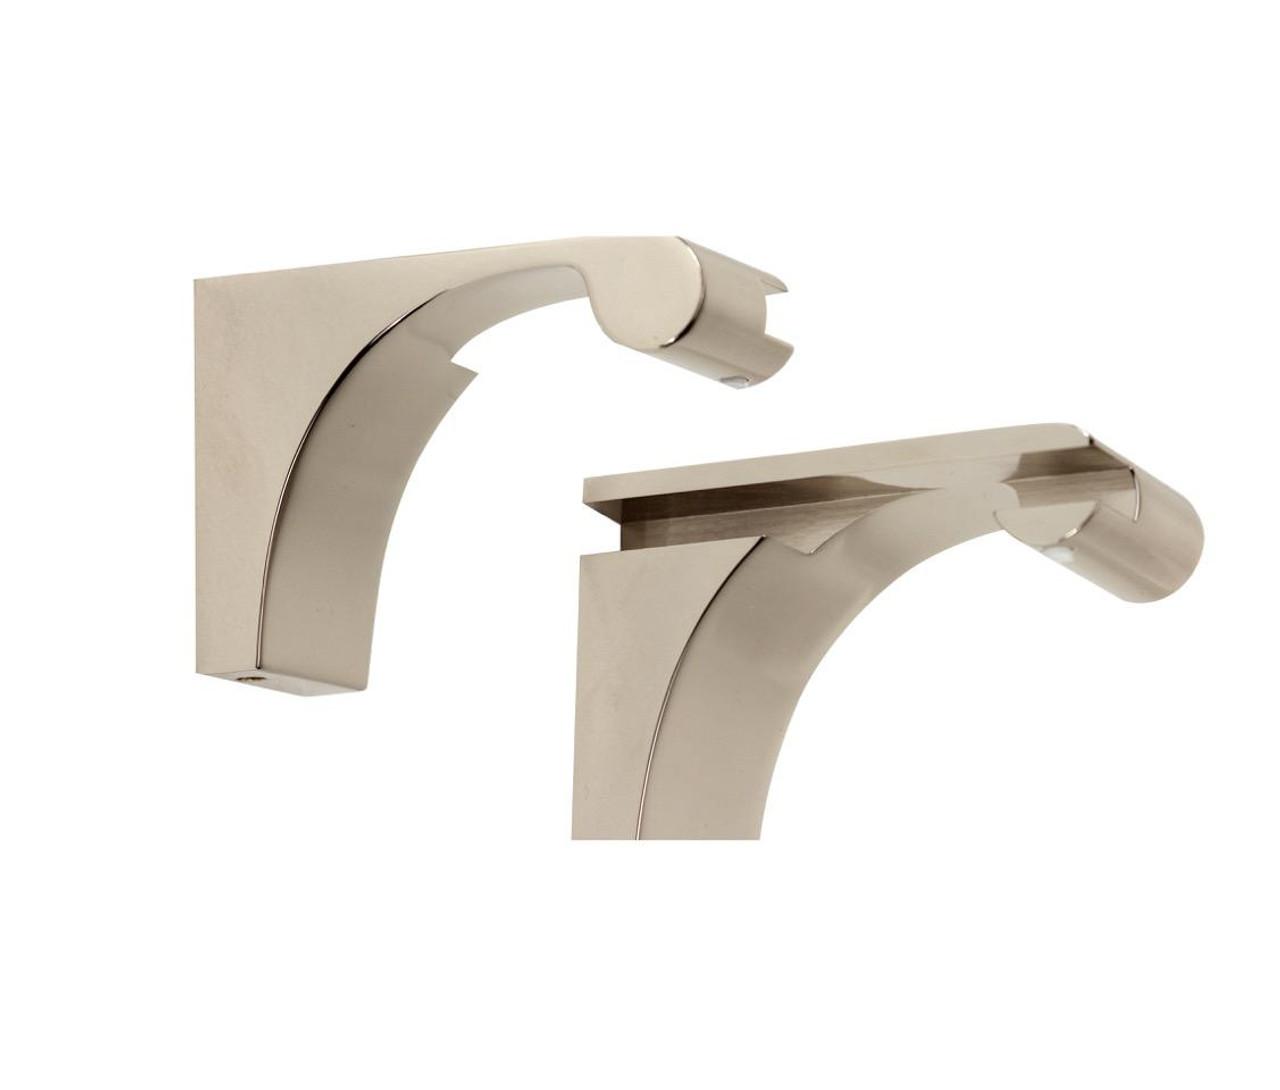 Shelf Brackets Only (Priced Per Pair) (ALNA6850-PN)